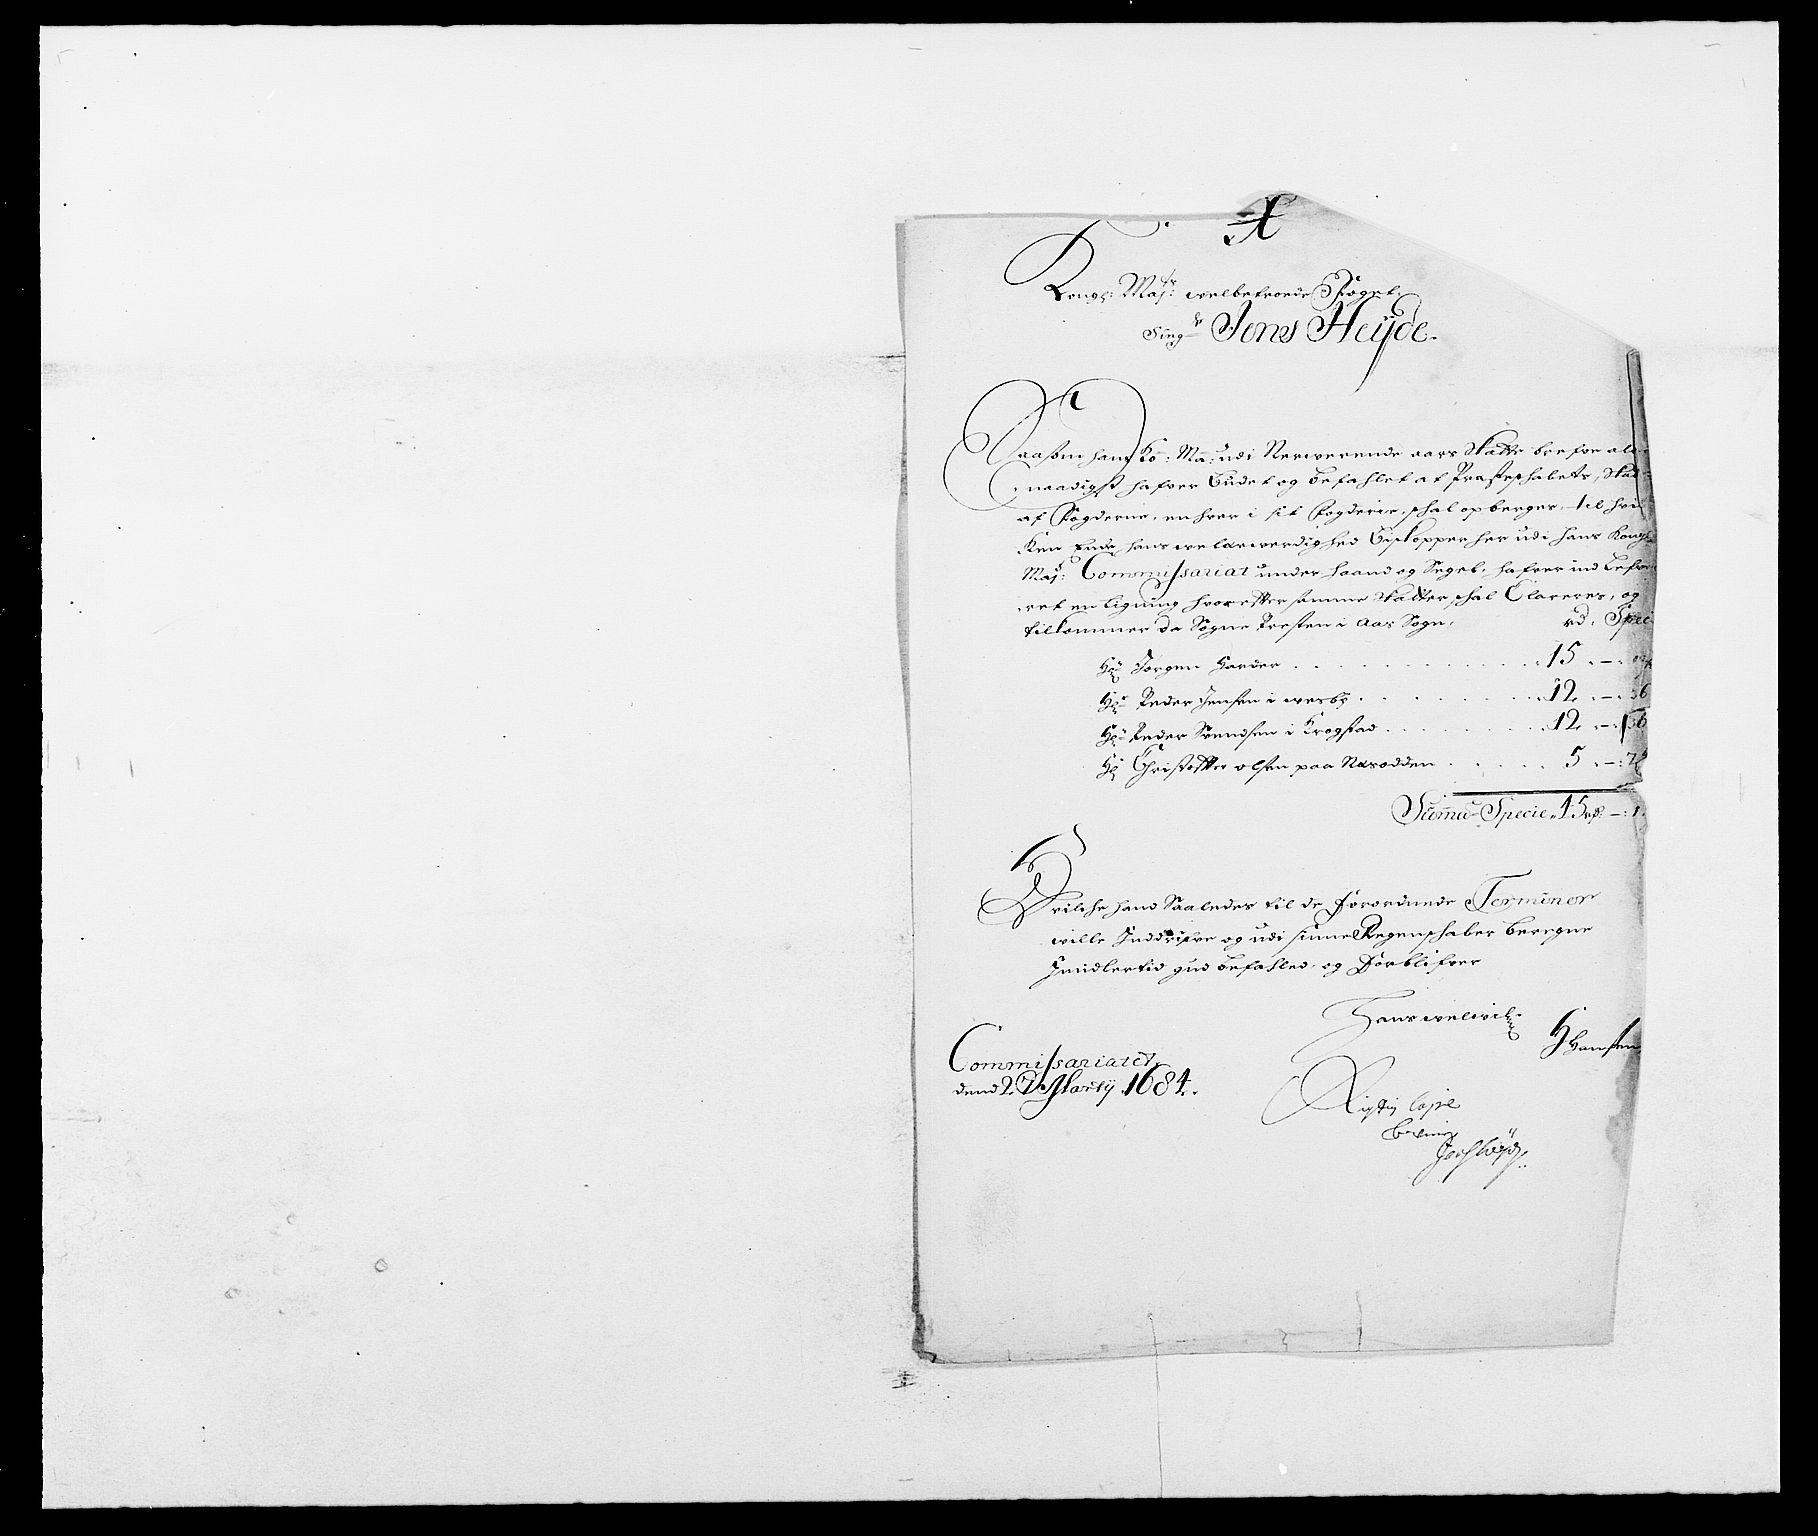 RA, Rentekammeret inntil 1814, Reviderte regnskaper, Fogderegnskap, R09/L0434: Fogderegnskap Follo, 1687-1688, s. 12